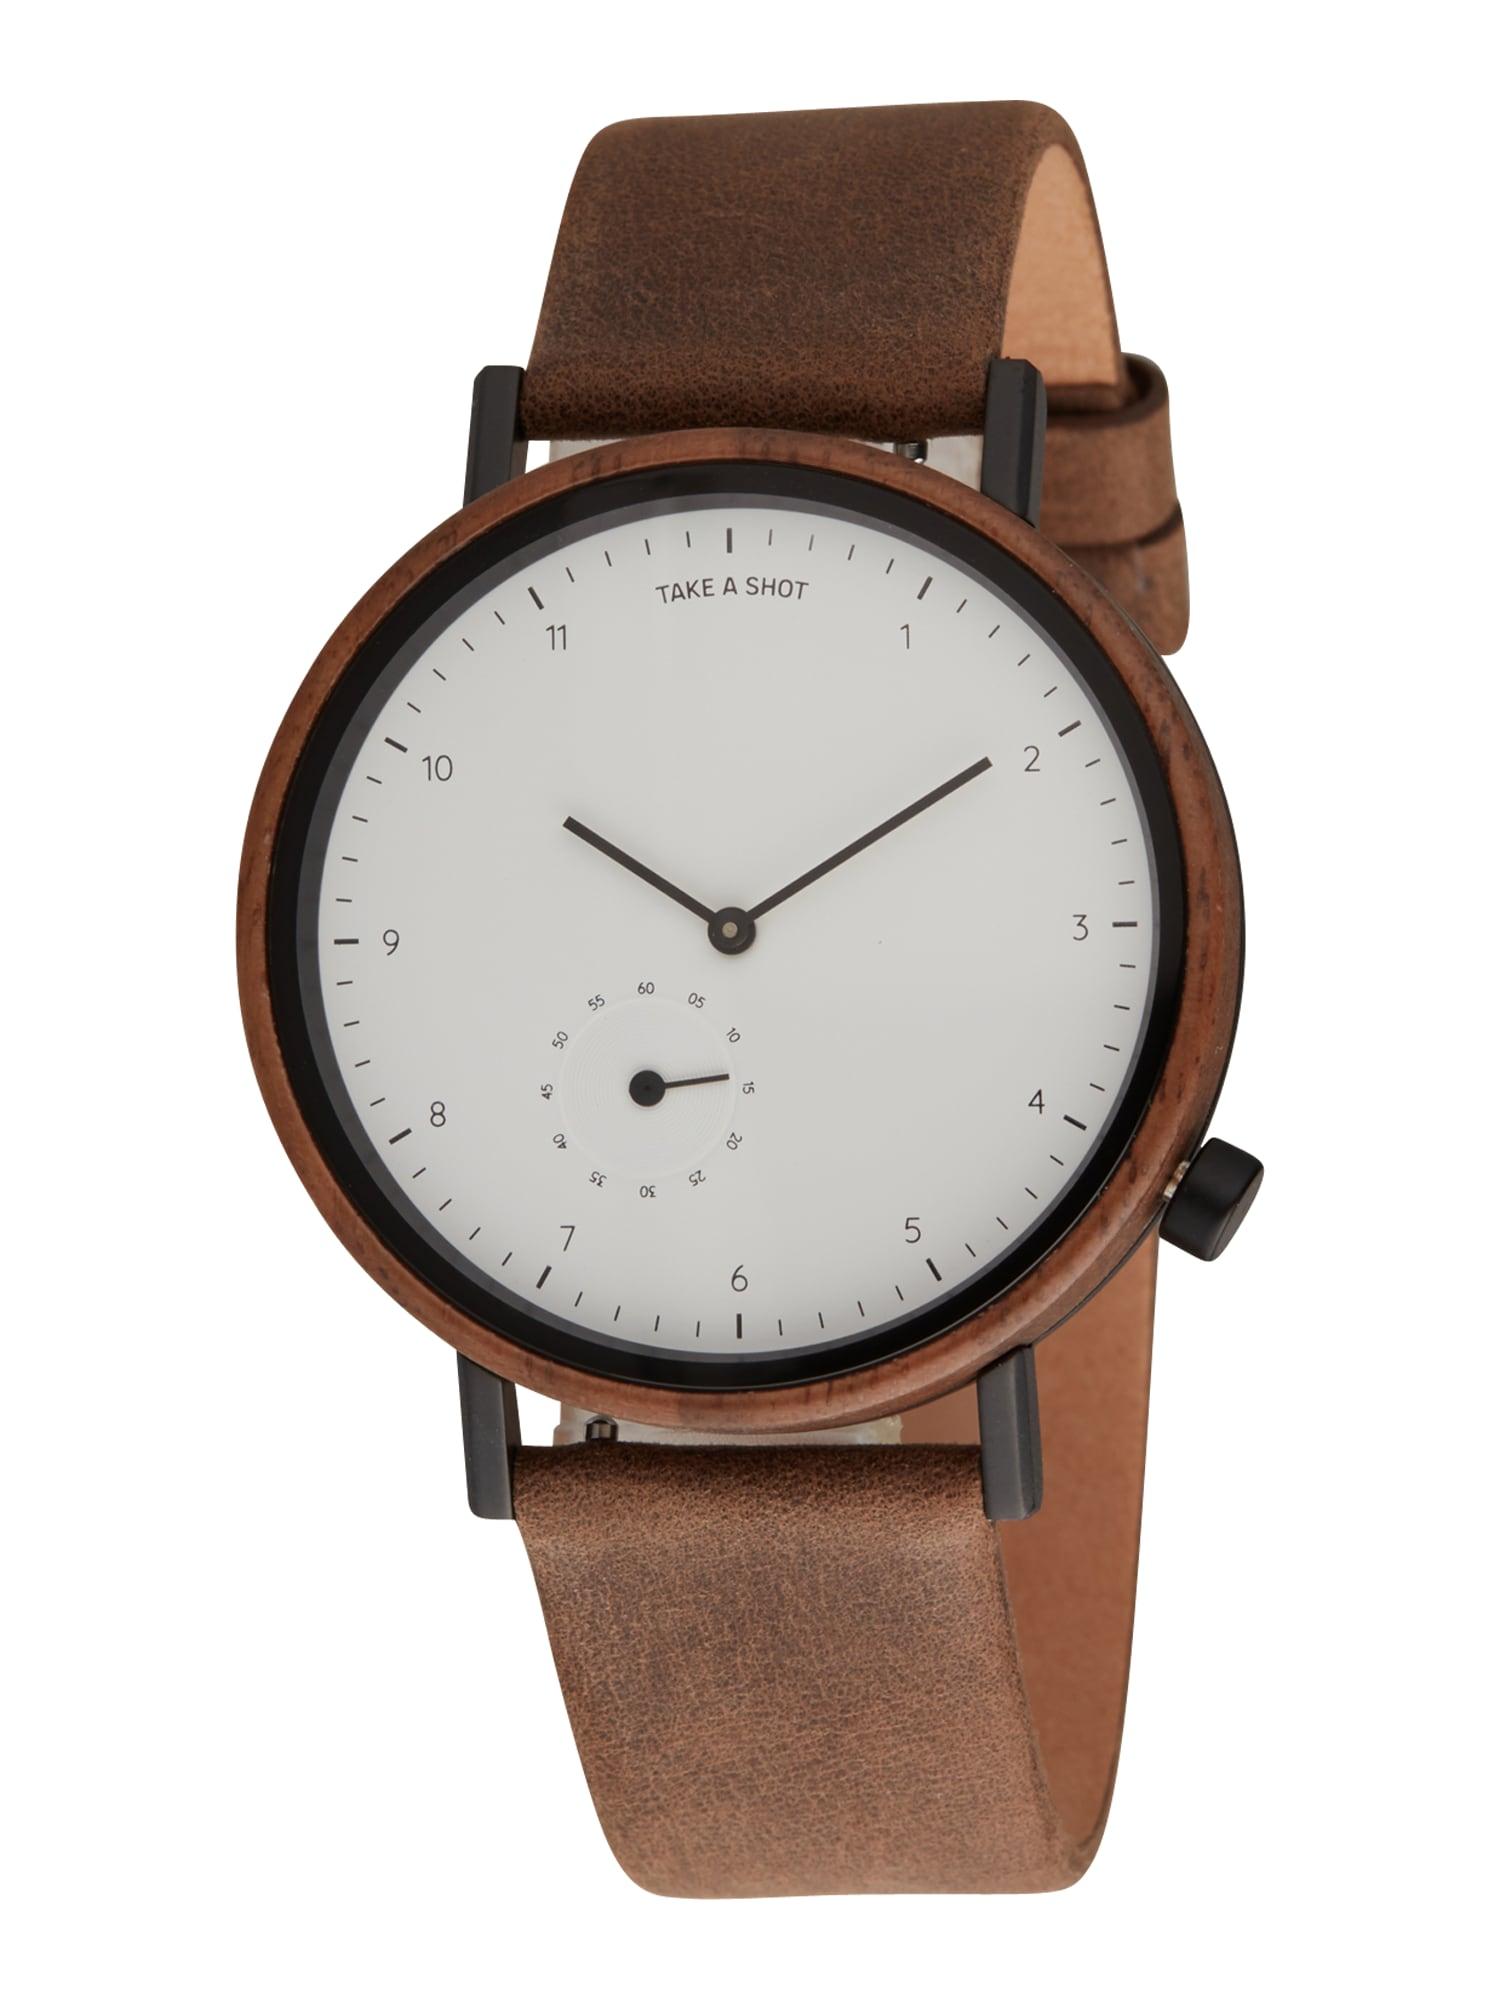 TAKE A SHOT Analoginis (įprasto dizaino) laikrodis ruda